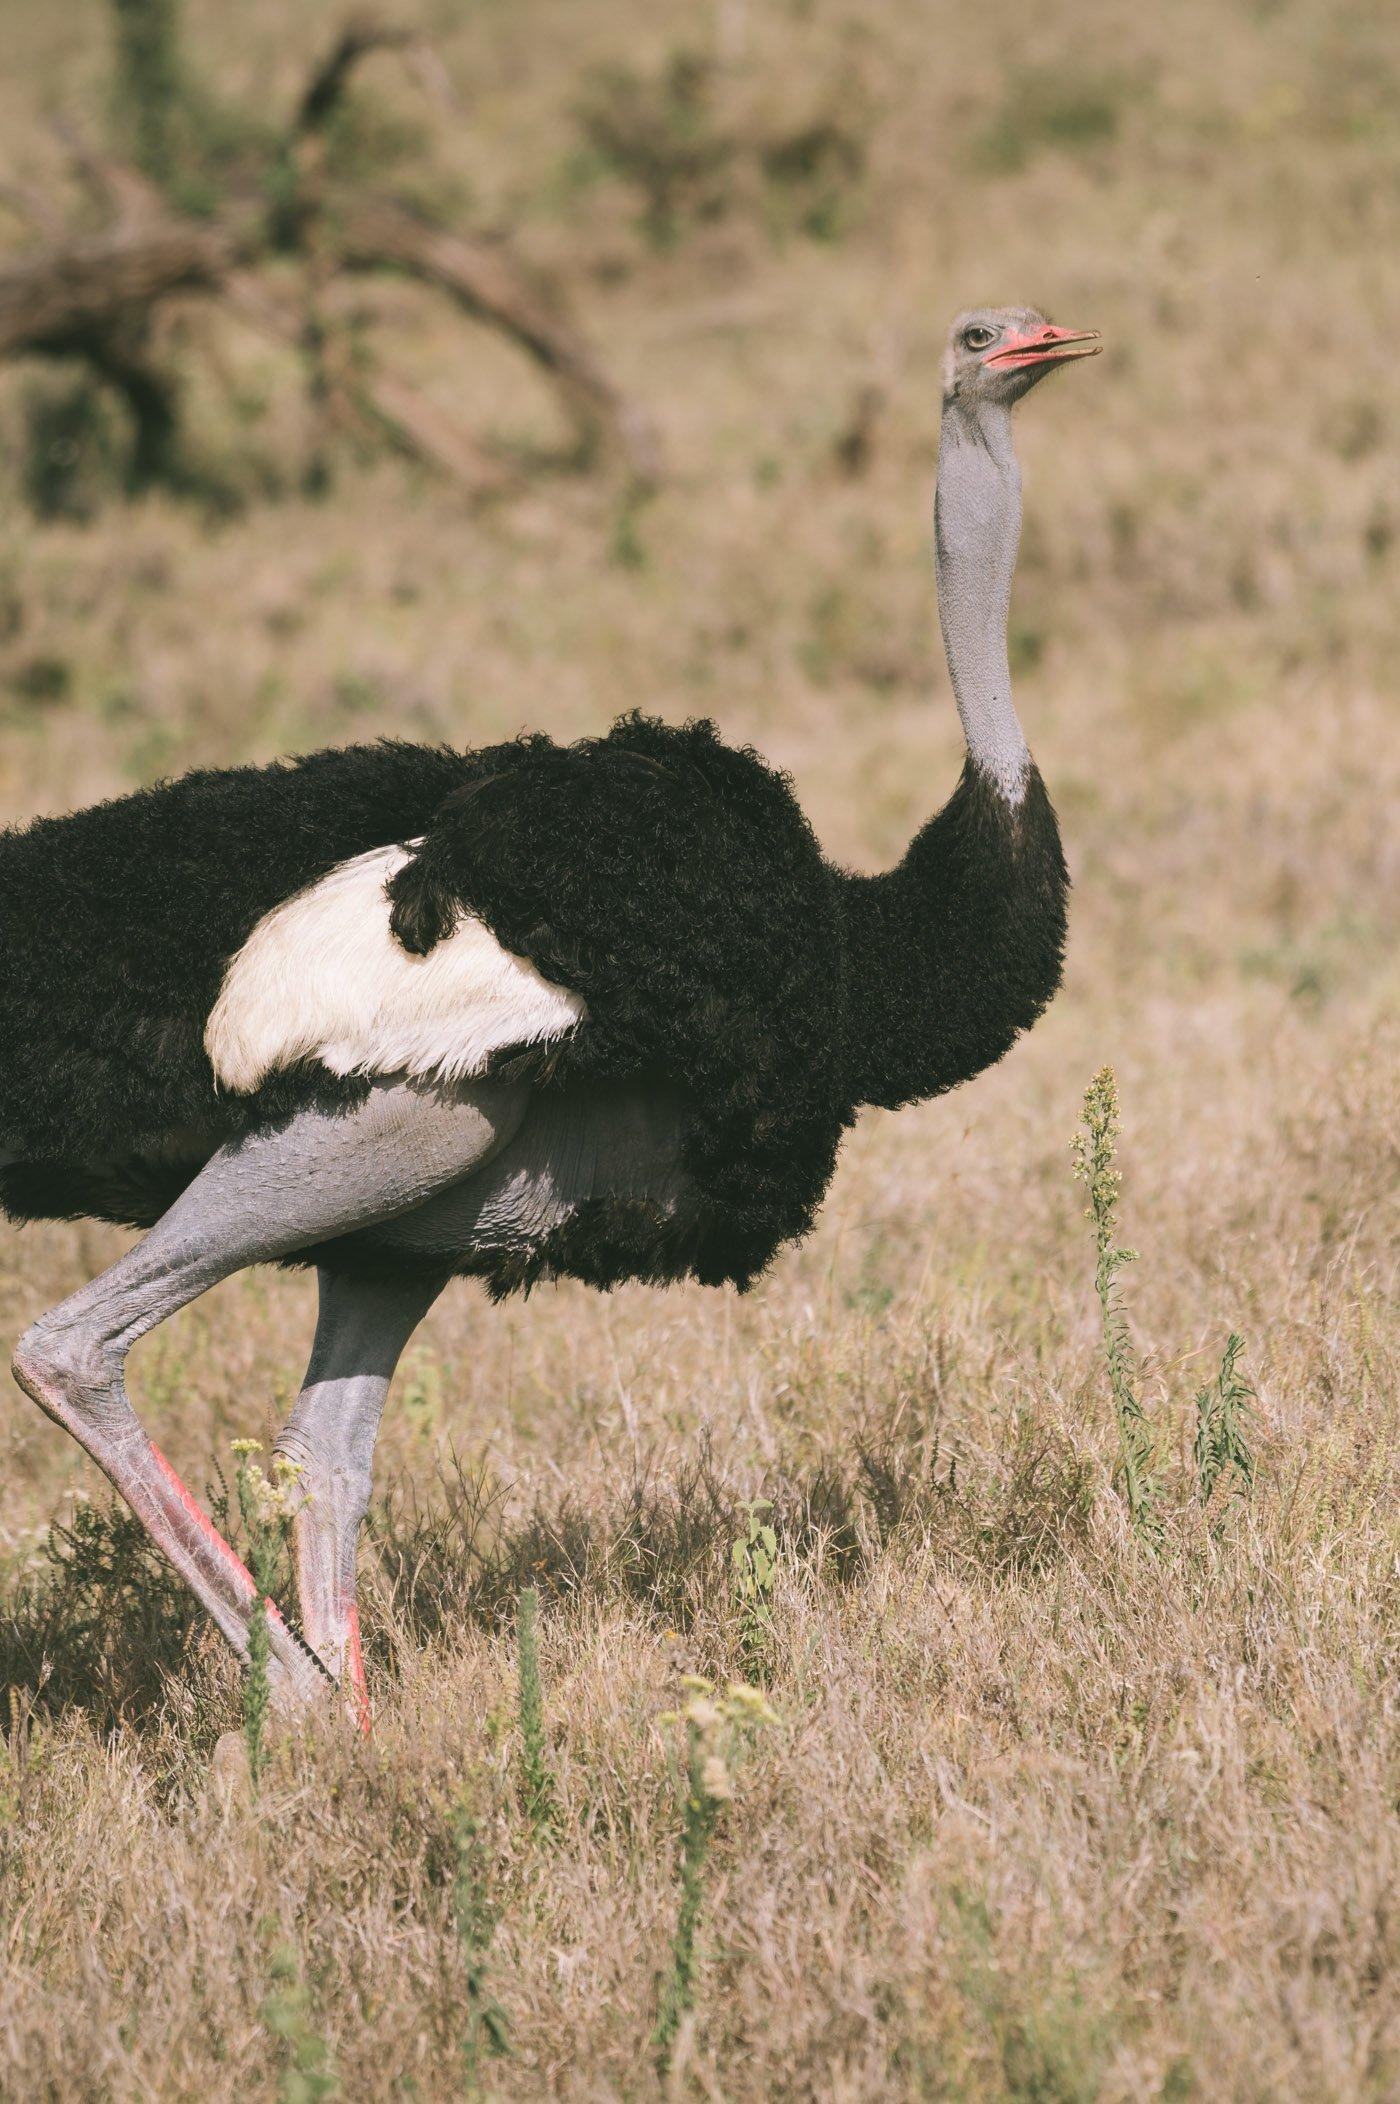 Ostrich at Lewa Wildlife Conservancy Kenya